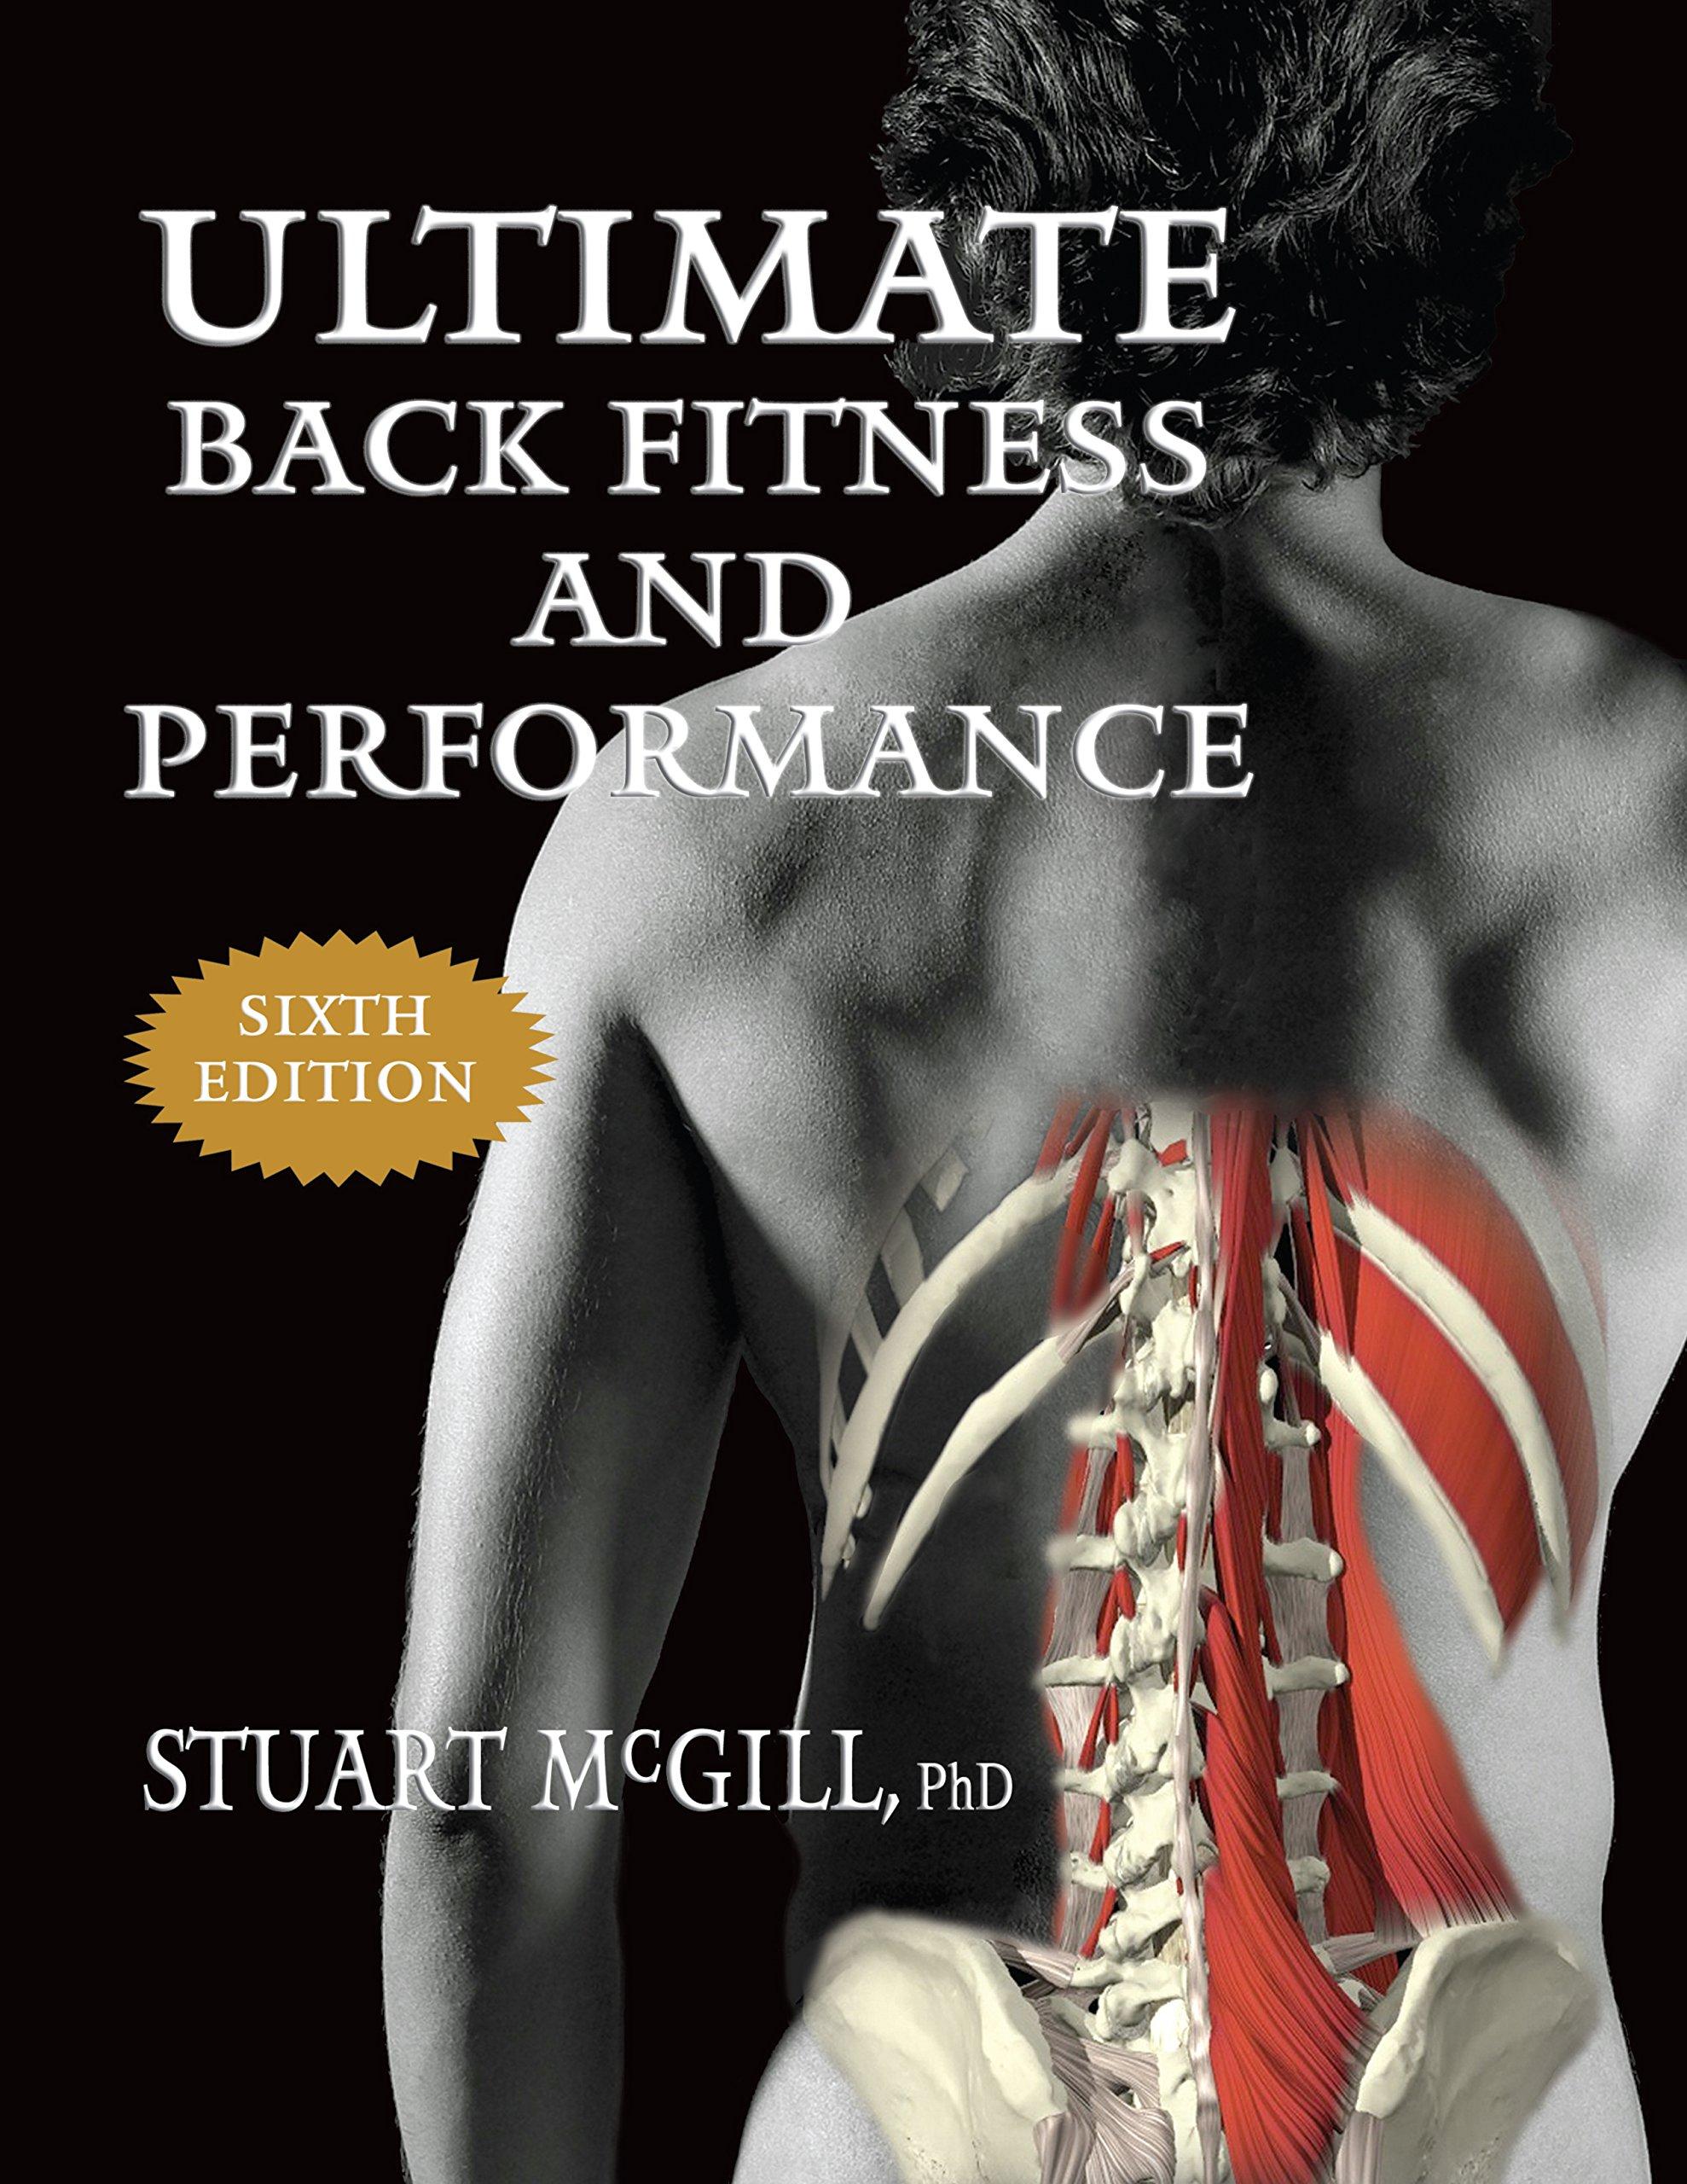 Ultimate Back Fitness and Performance-Sixth Edition: Stuart McGill:  9780973501834: Amazon.com: Books